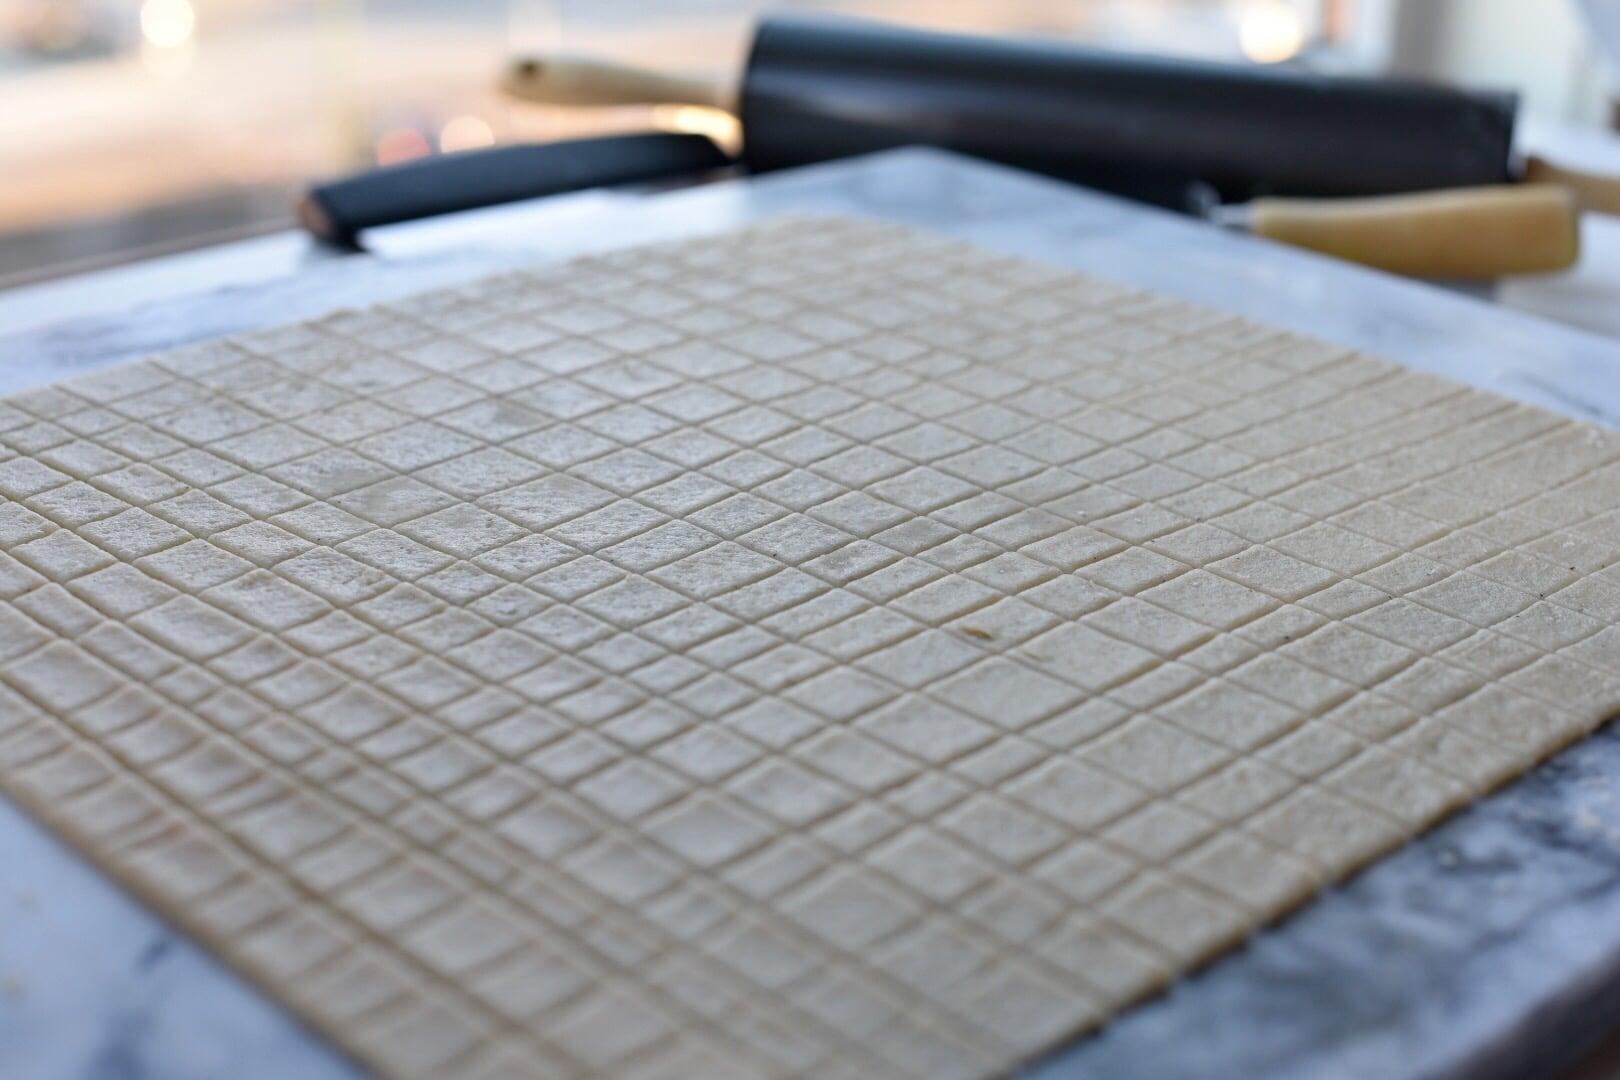 Chin Chin dough cut into squares